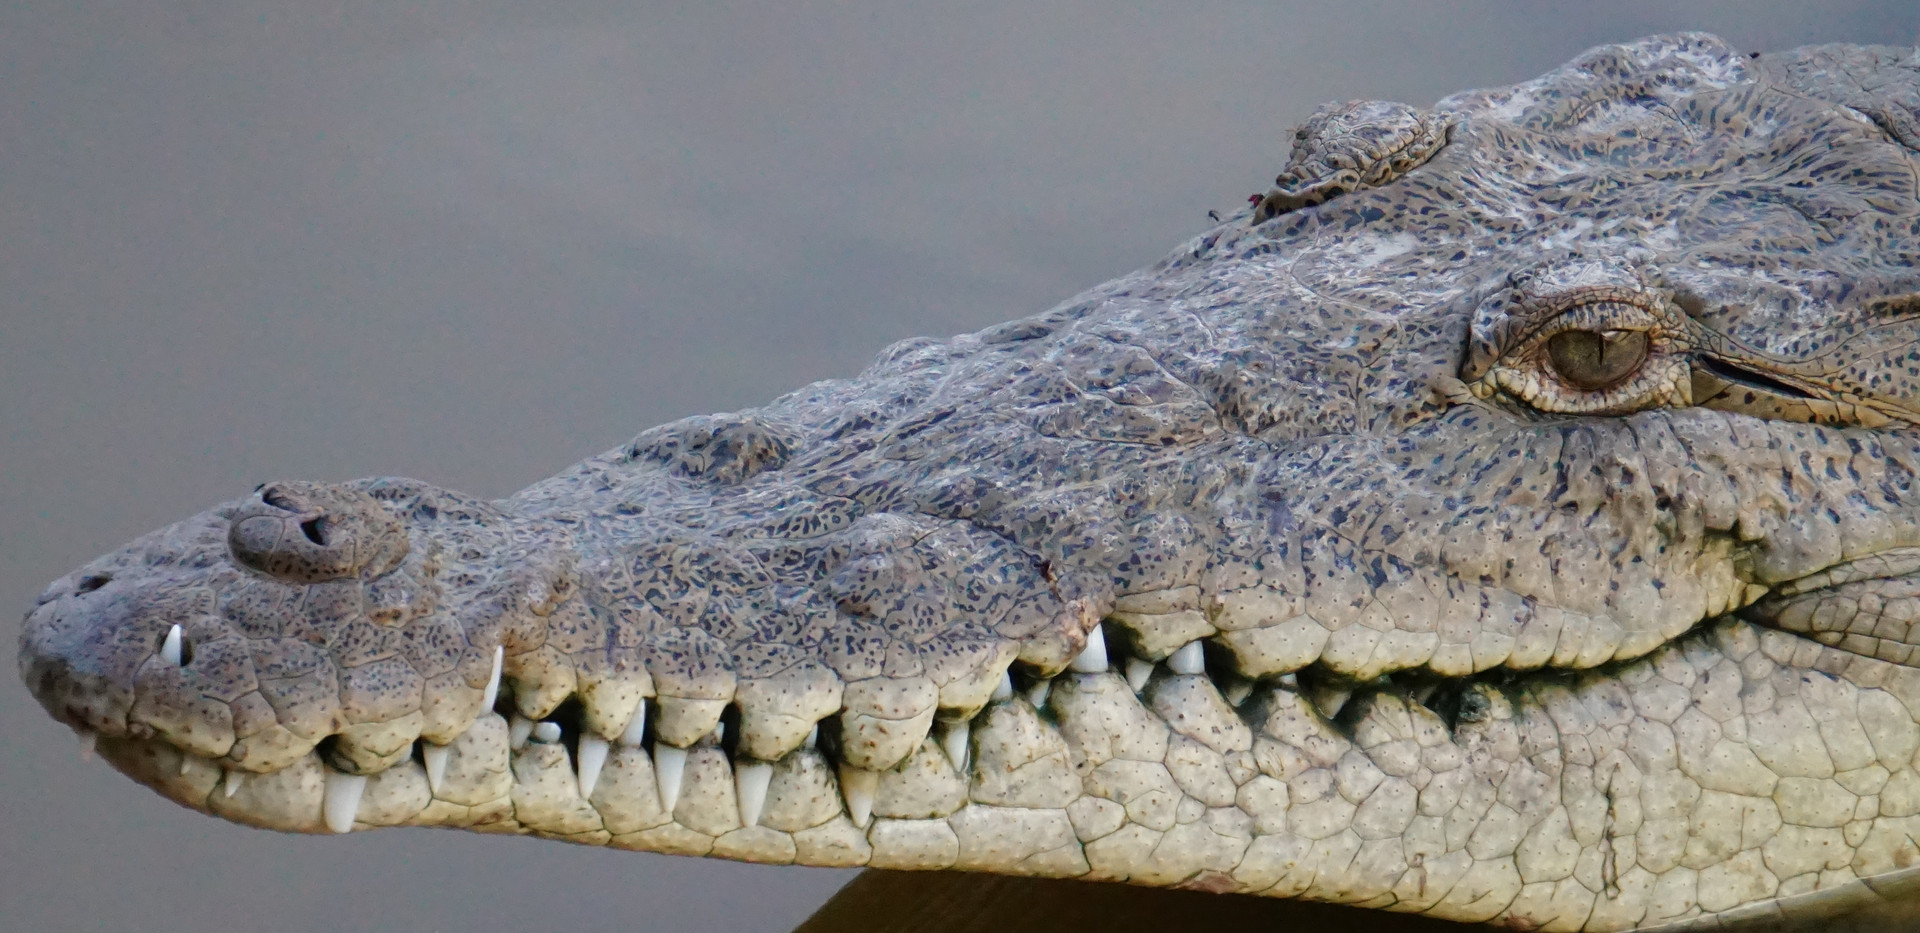 Alligator San Blas.JPG